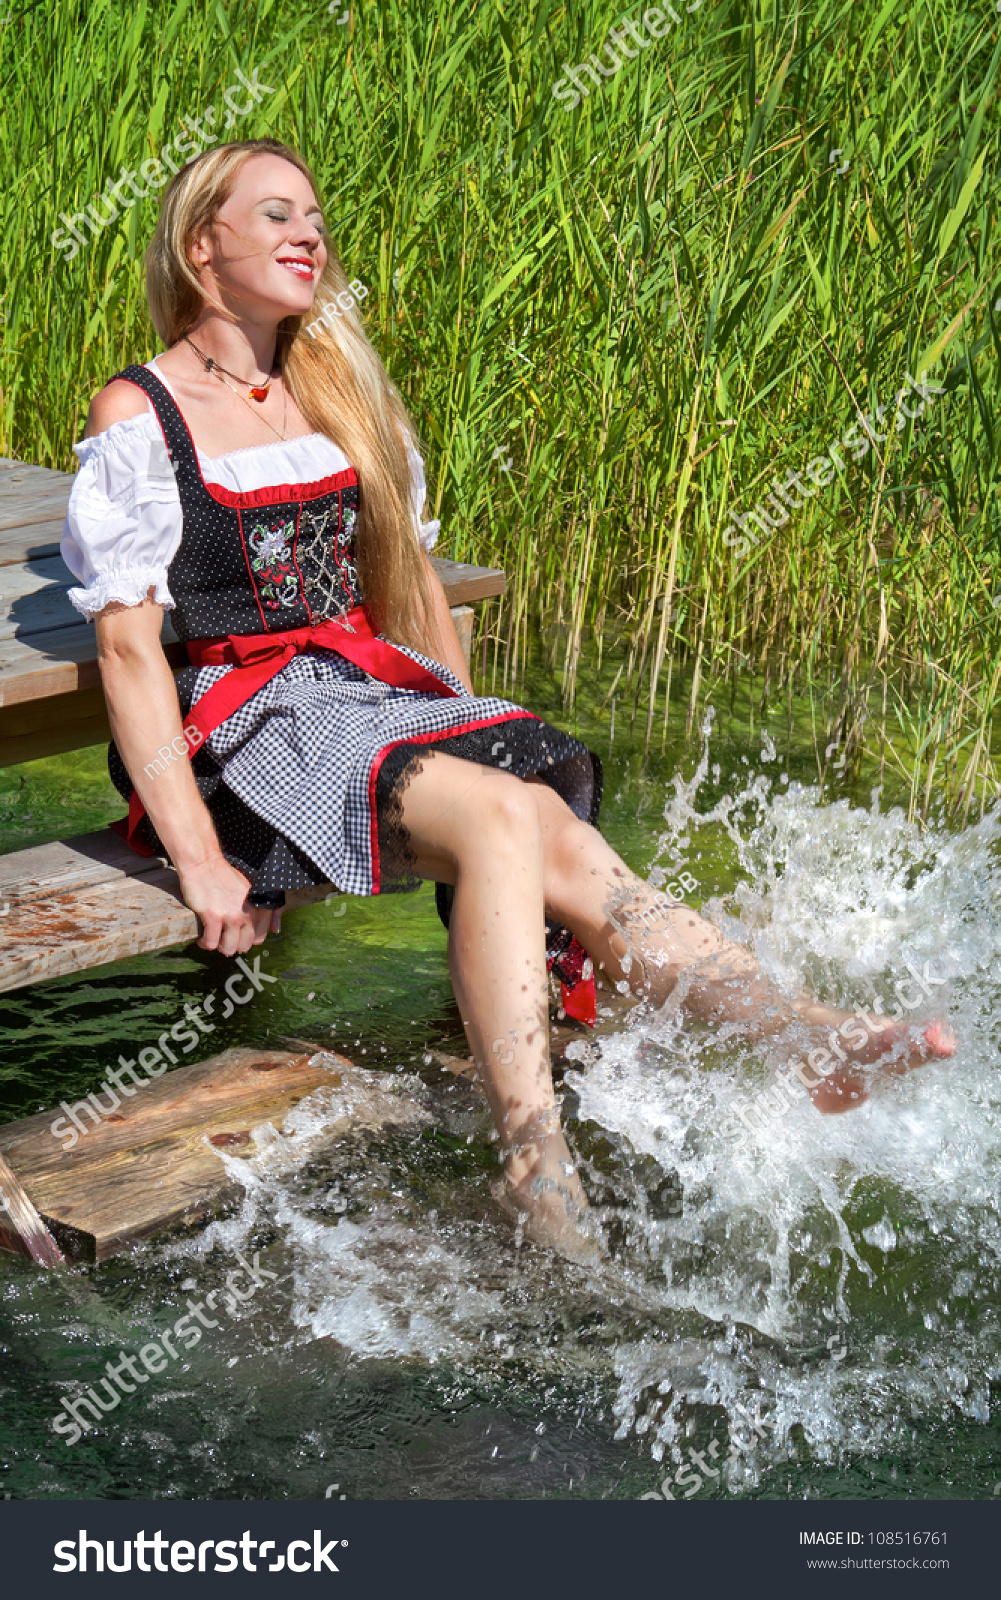 German women having fun